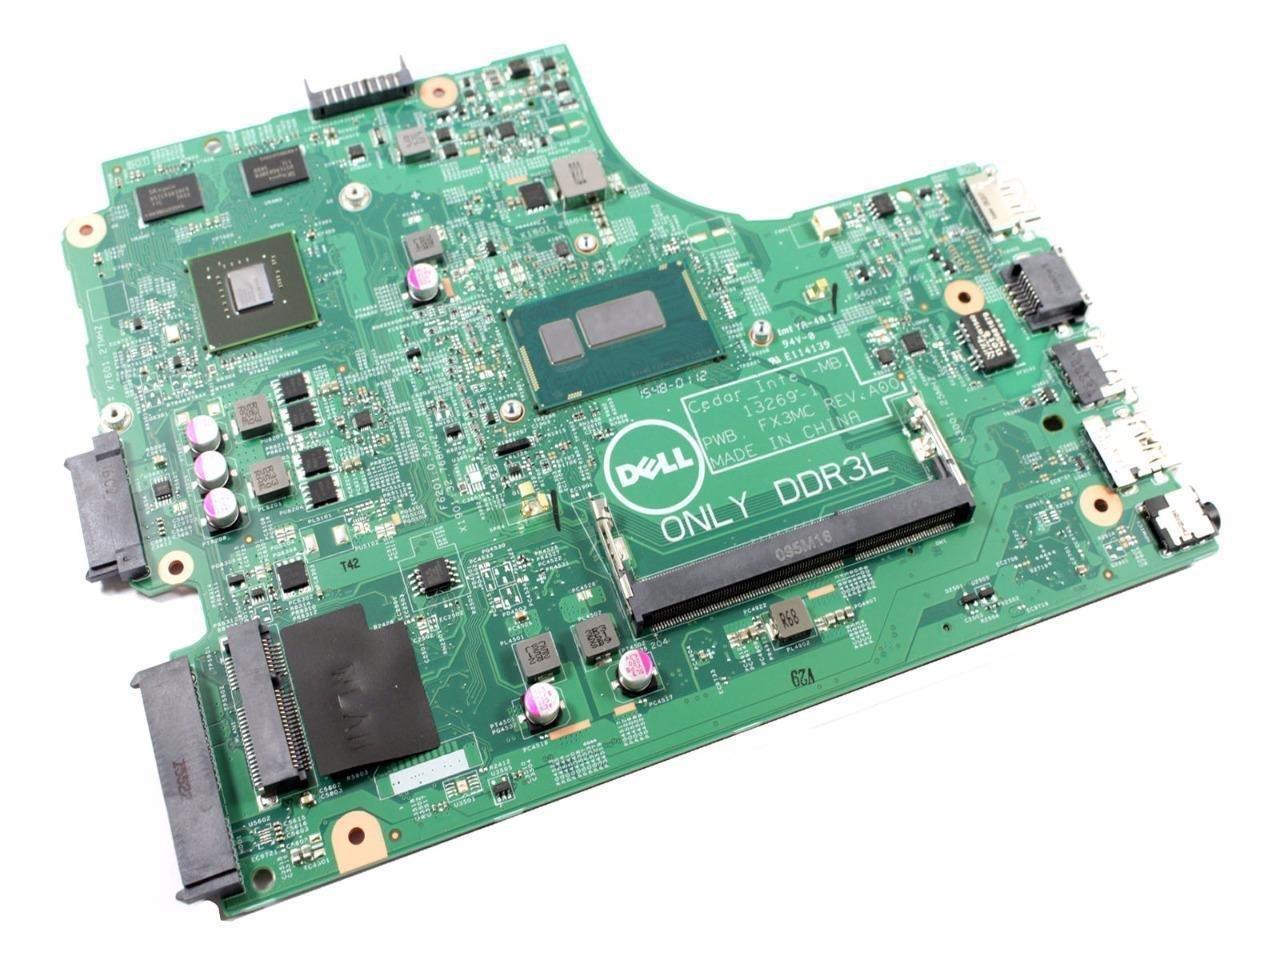 Dell Inspiron 15-3542 Intel Pentium 3558U 1.70 GHz DDR3 SDRAM 1 Memory Slot HD Graphics 2 USB Ports Motherboard N4C2G FX3MC P34KX 0P34KX 0N4C2G CN-0N4C2G